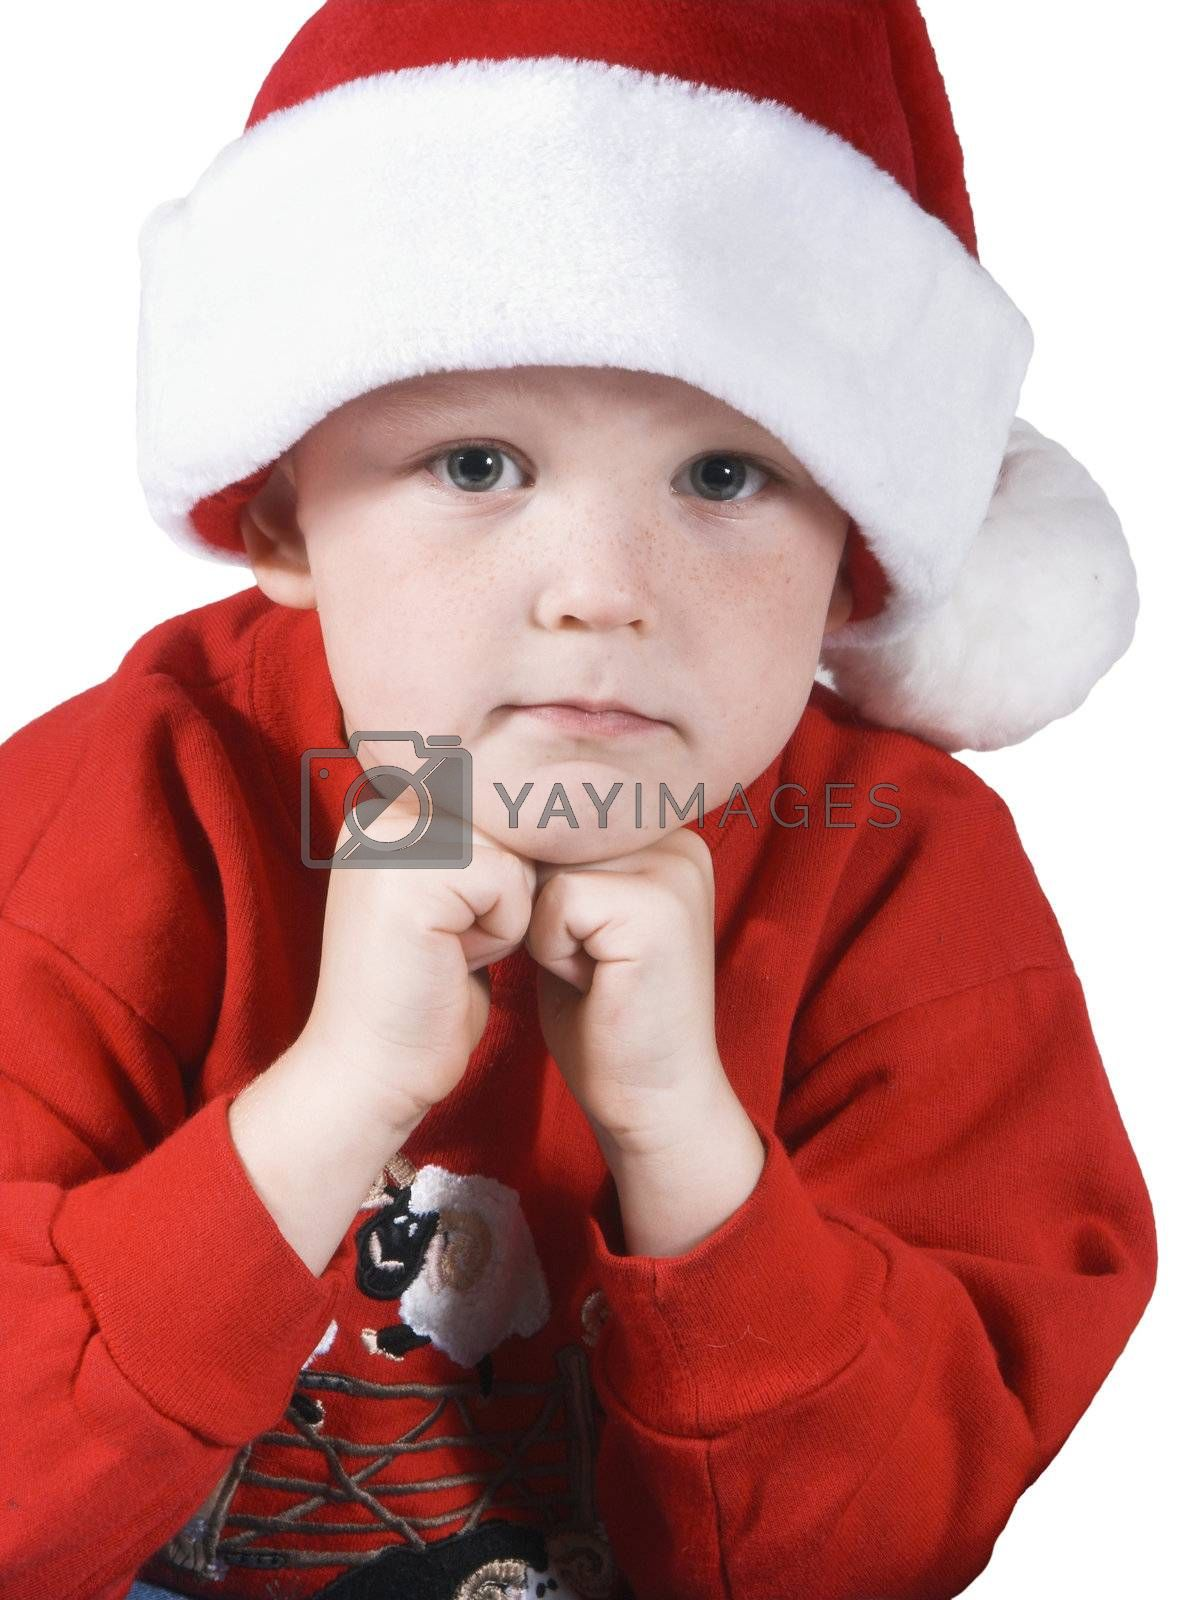 isolated child on white thinking or wishing with santa hat